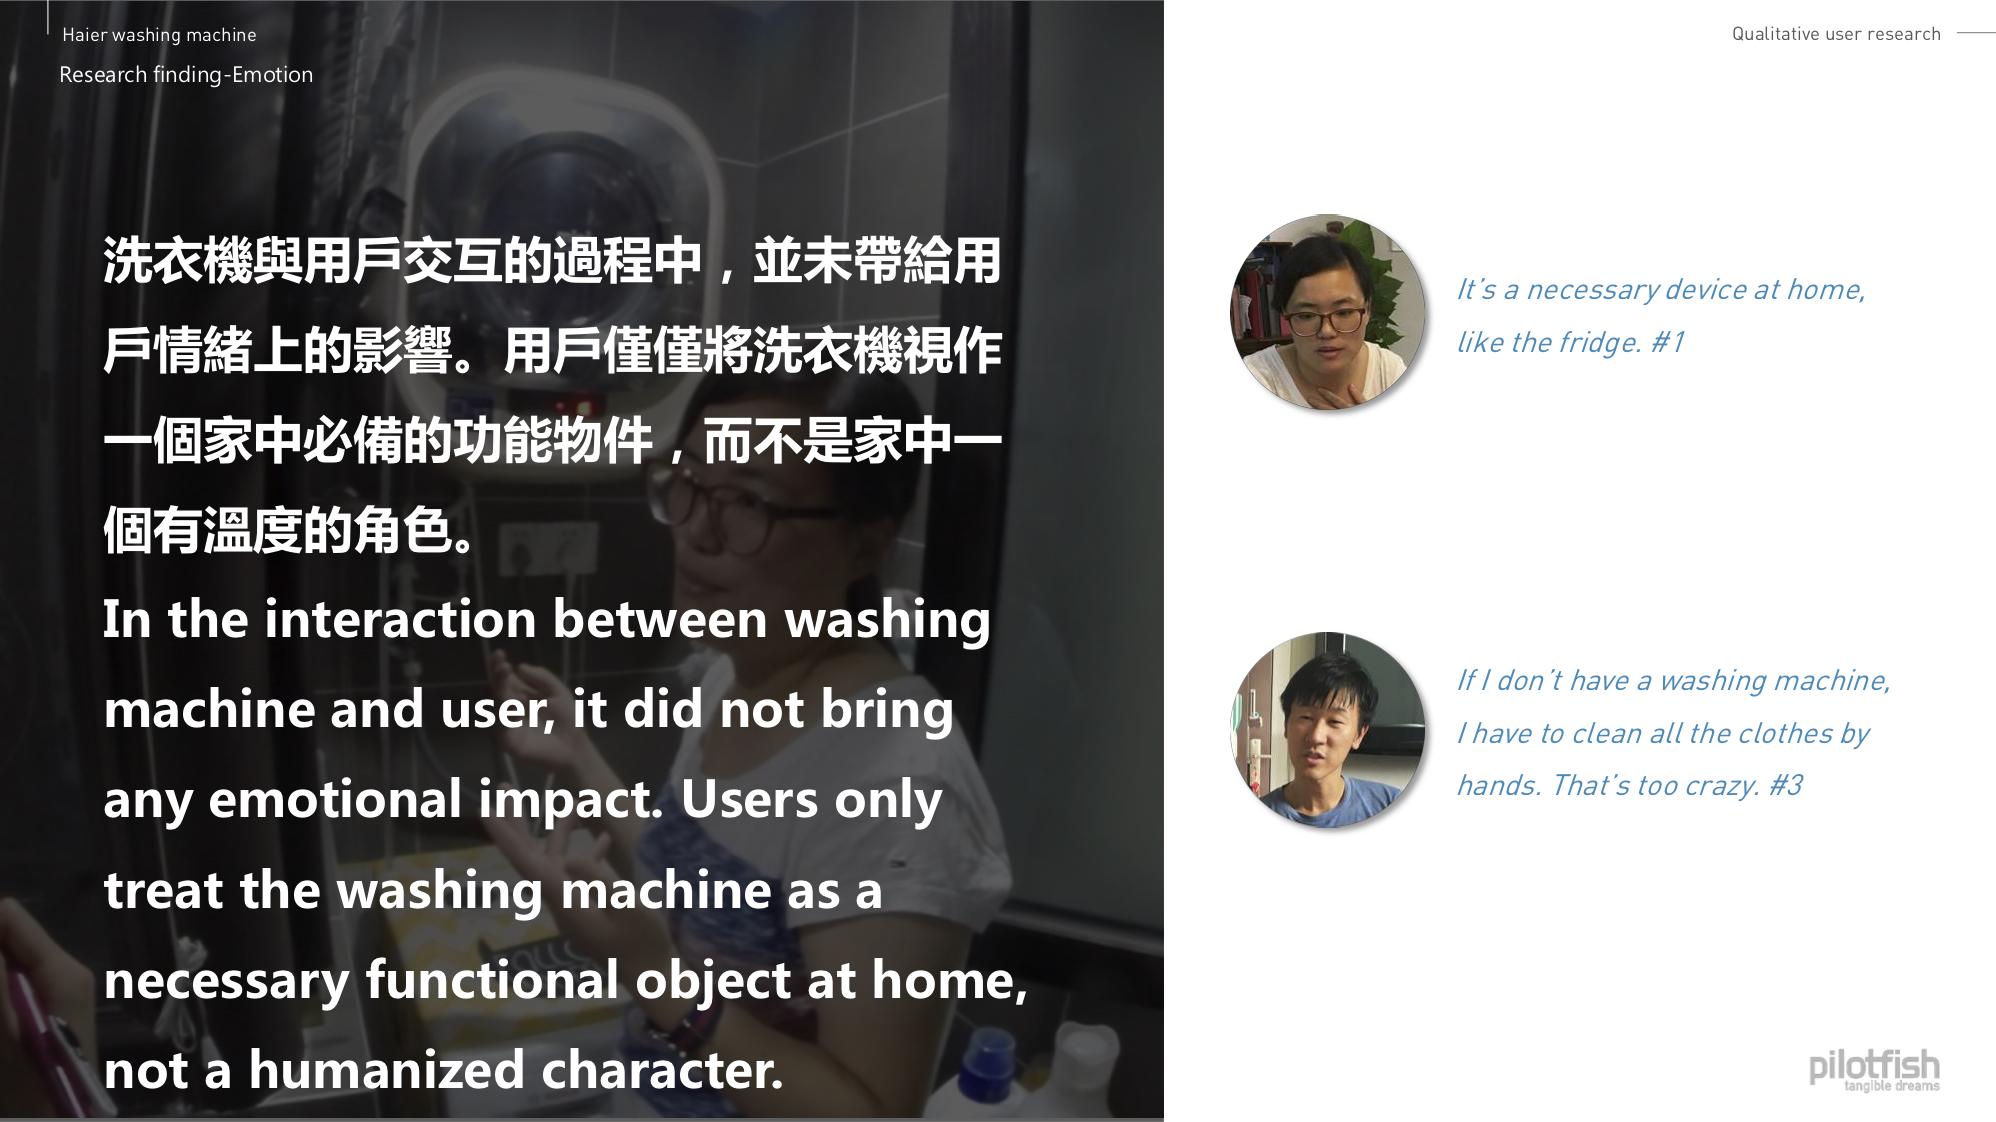 20170727_Haier_washing machine innovative UI_P0 presentation_V4_Eng_35.jpg